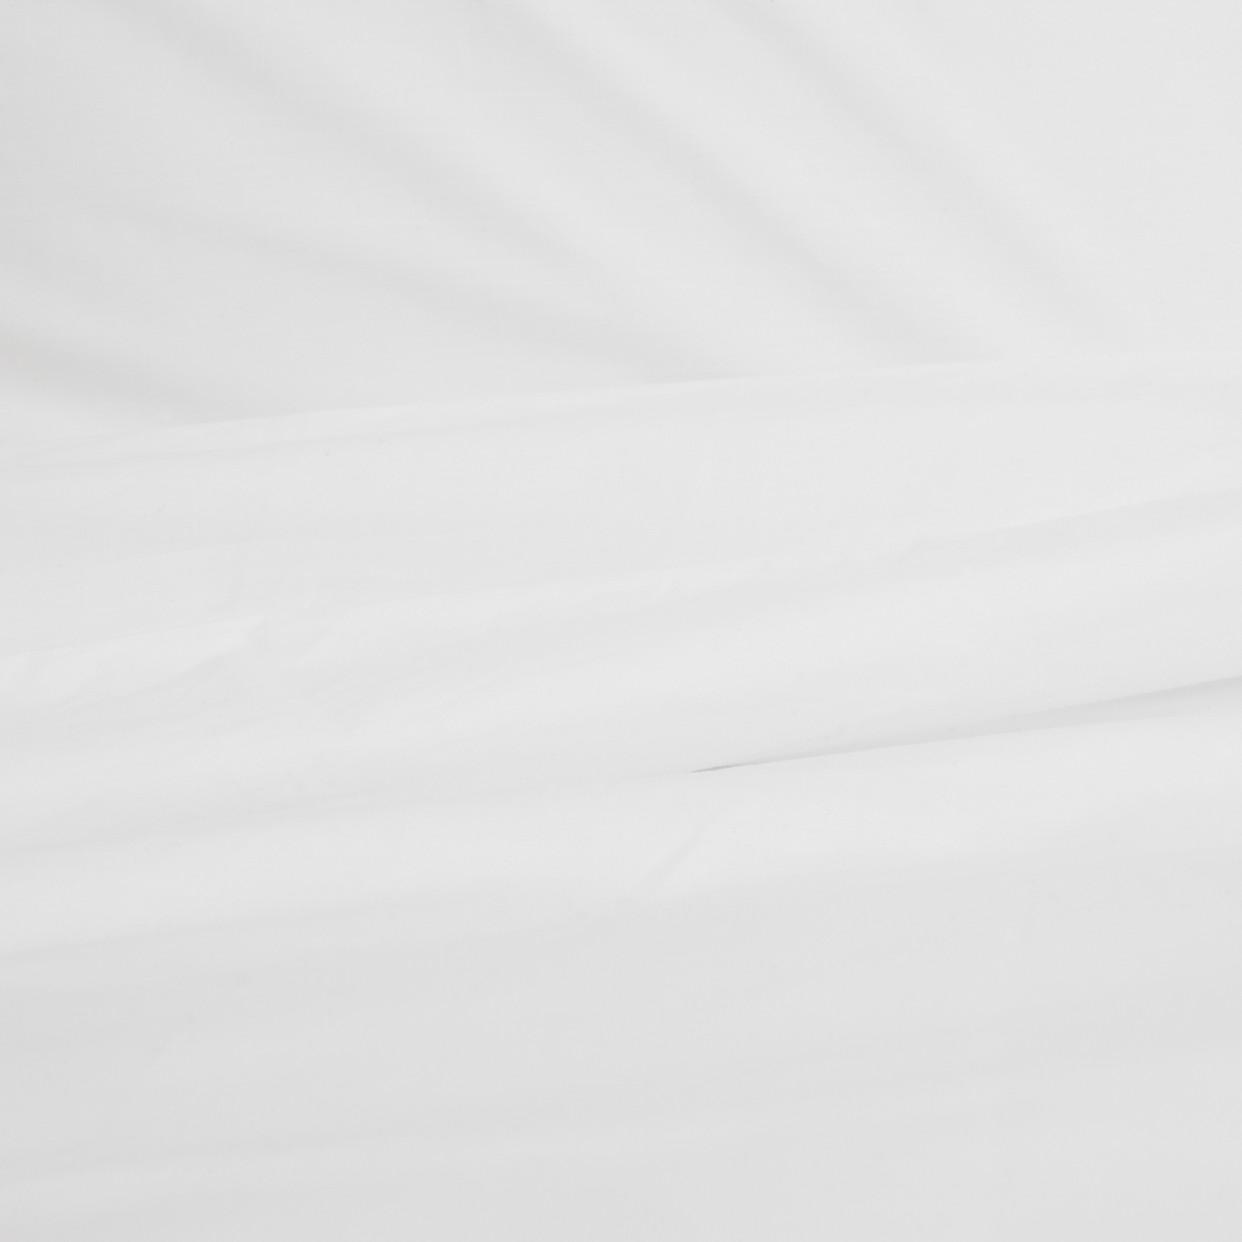 Bettbezug Les Essentiels | Weiß-240x220cm